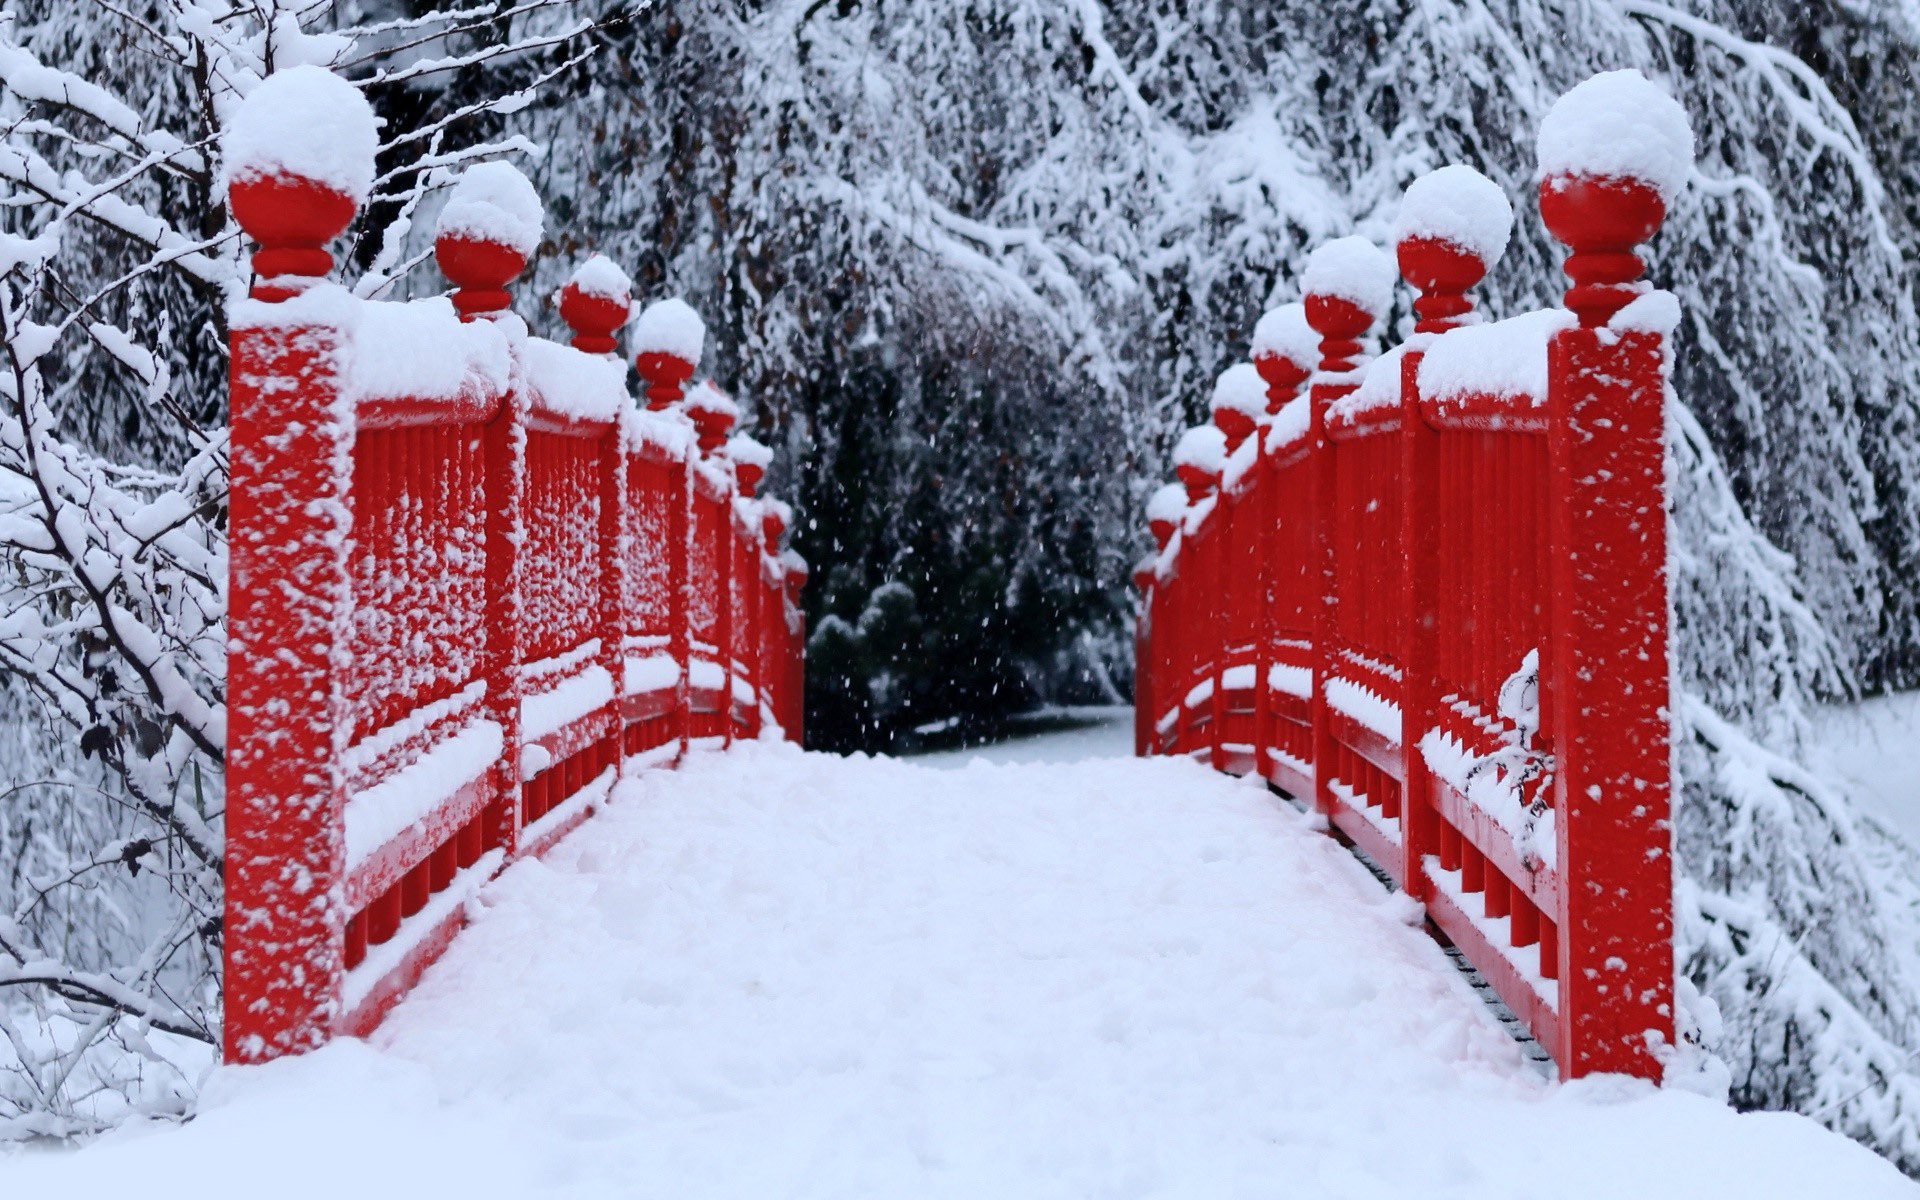 wallpapertvs.com snowy bridge winter hd wallpaper